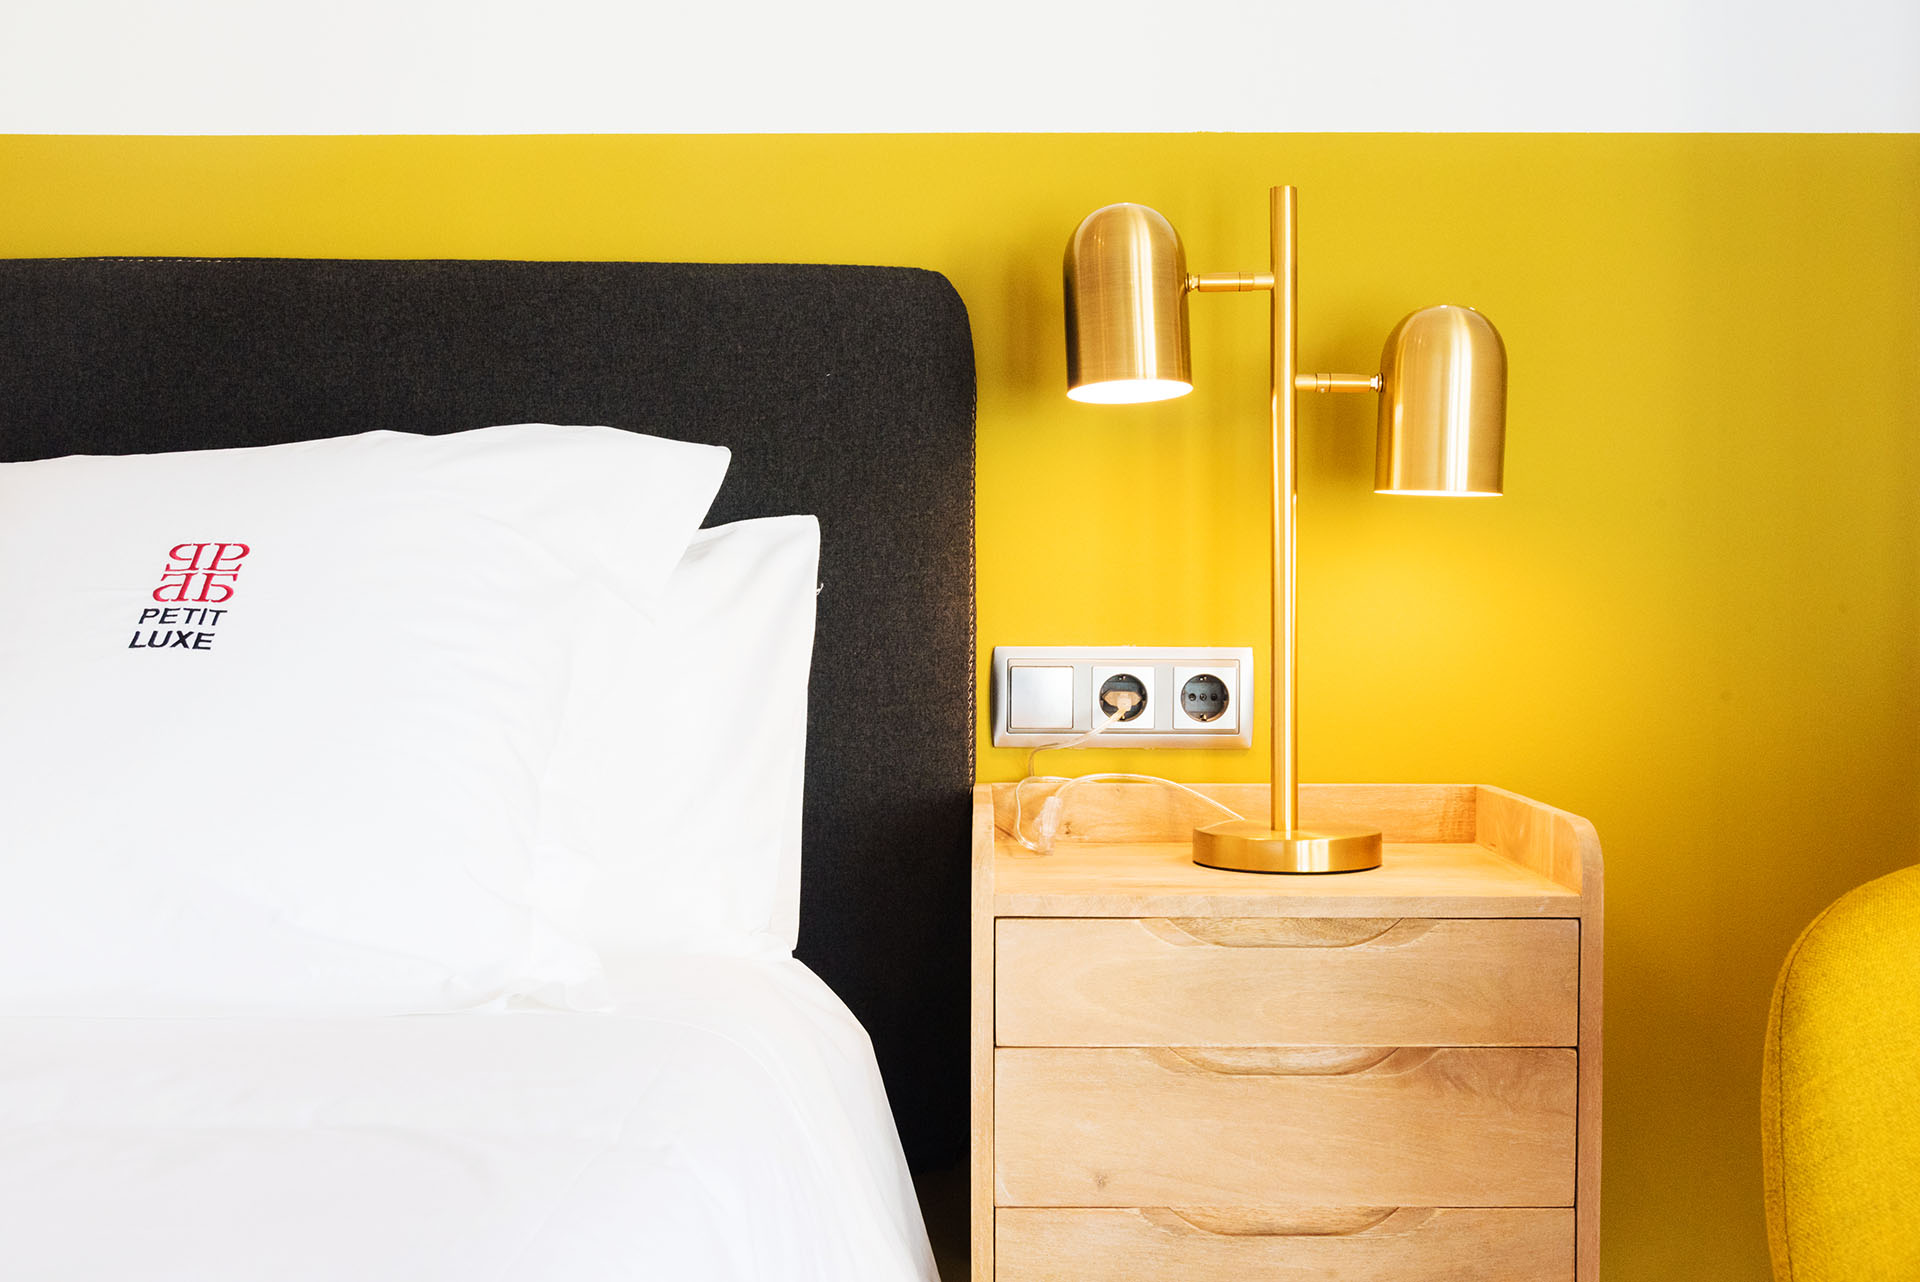 PetitLuxe Apartamentos de Lujo en Terrassa, Tarragona - A 20 minutos de Barcelona